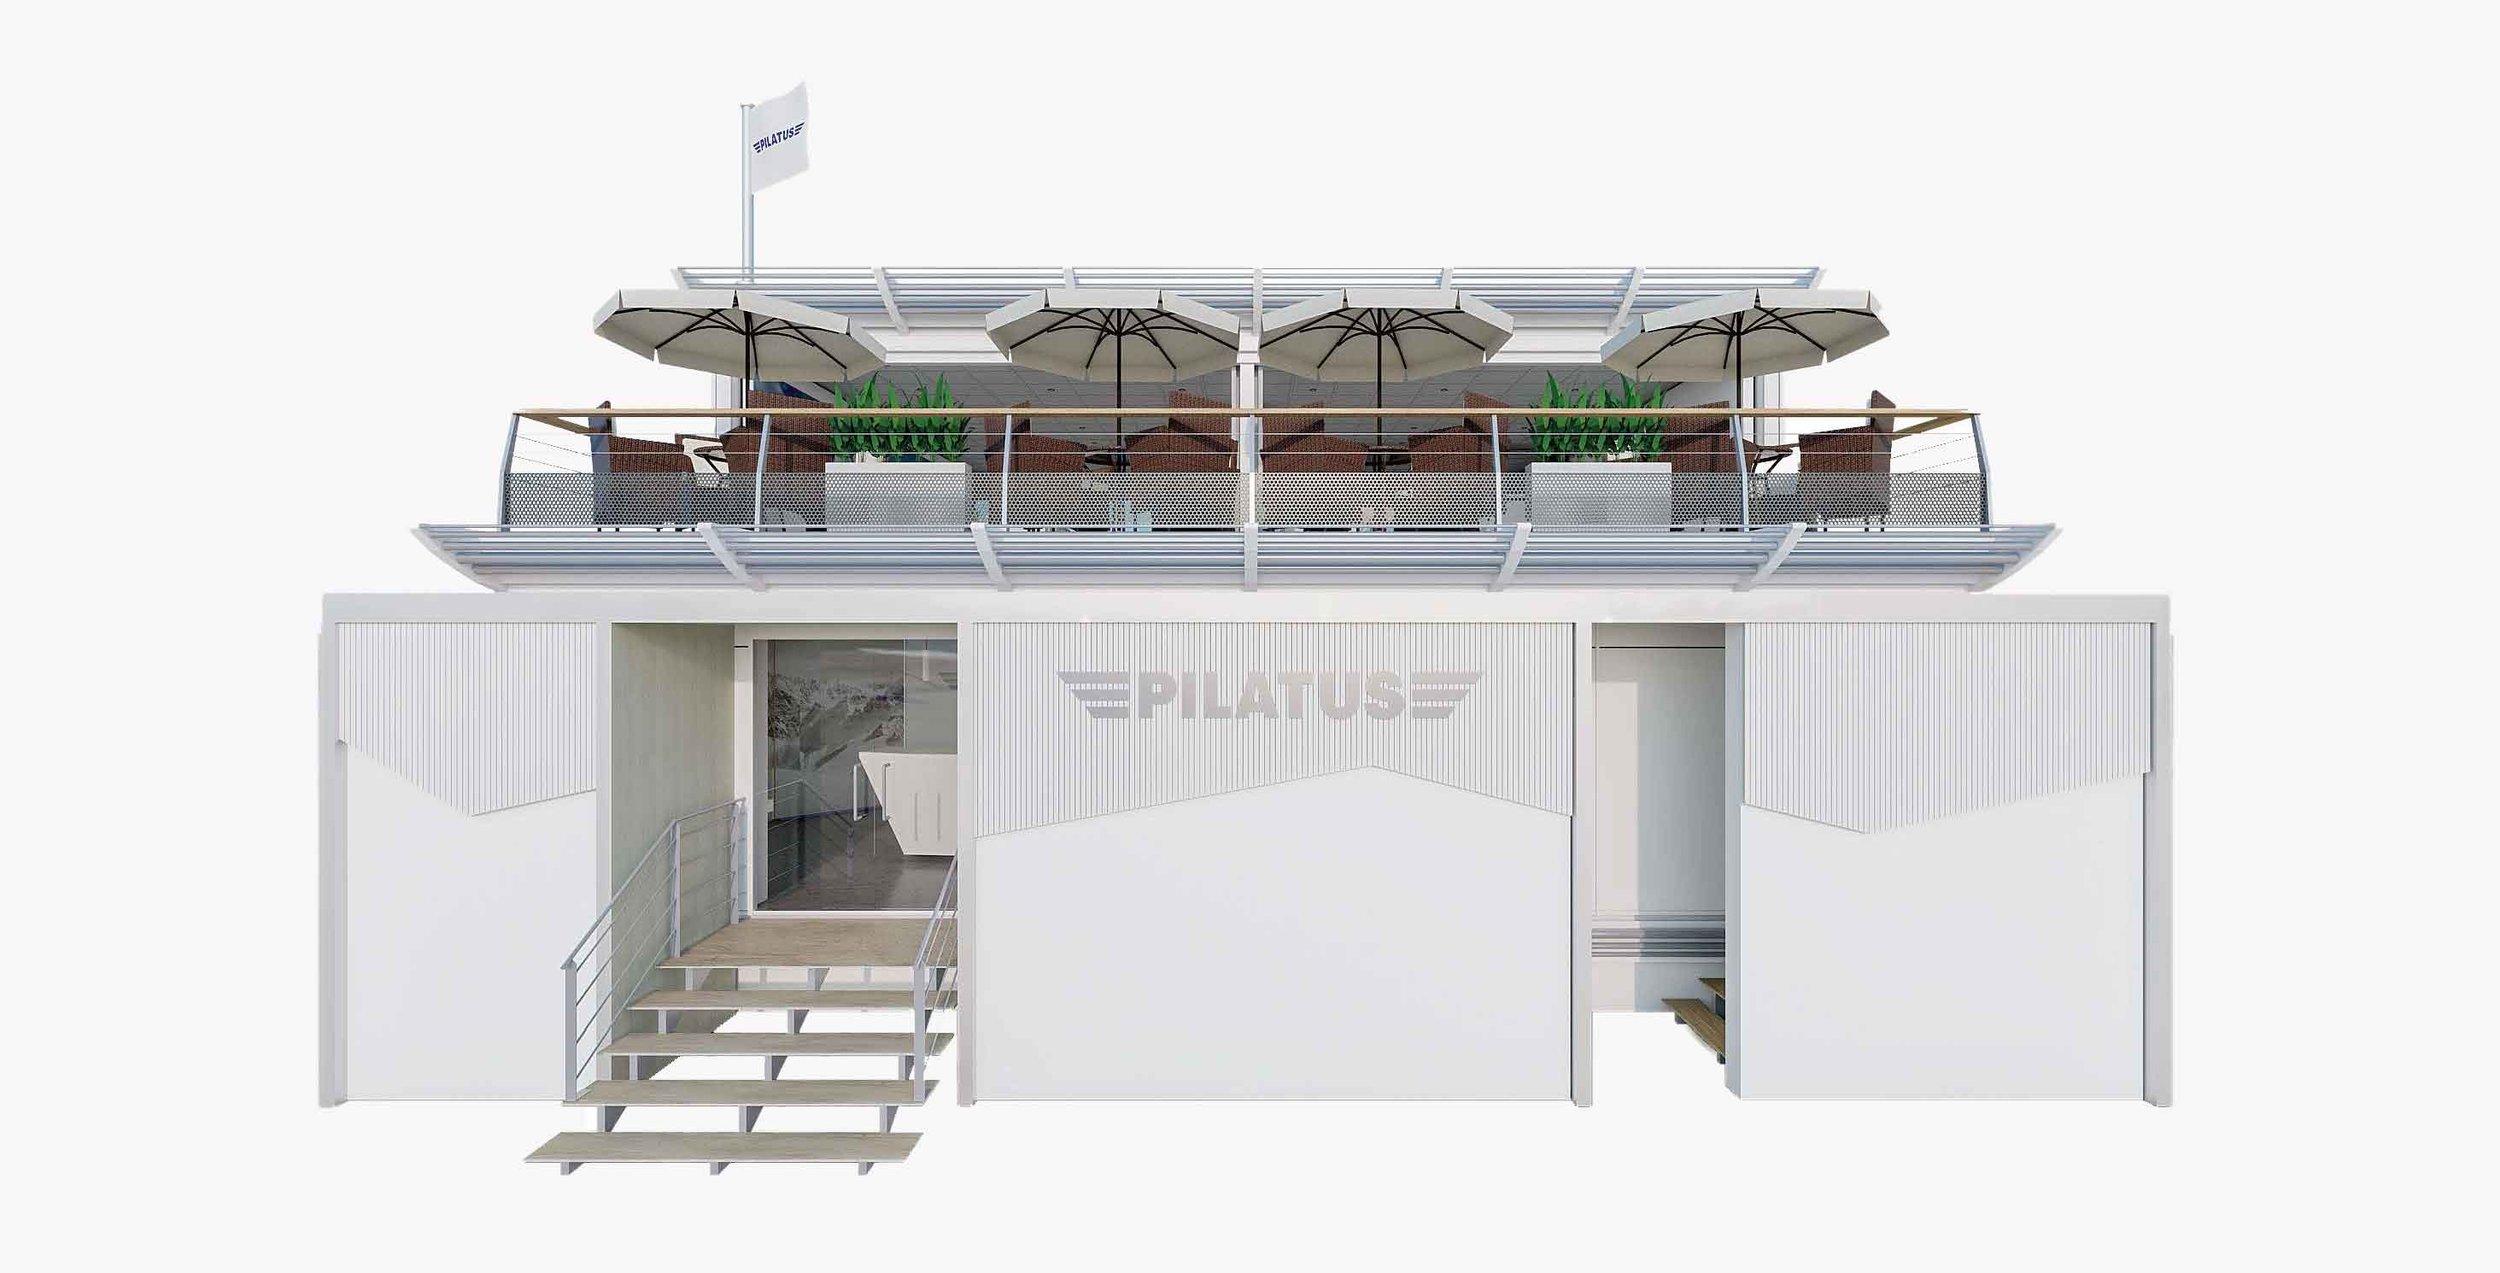 Pilatus_Double_Deck_Visual_01.jpg